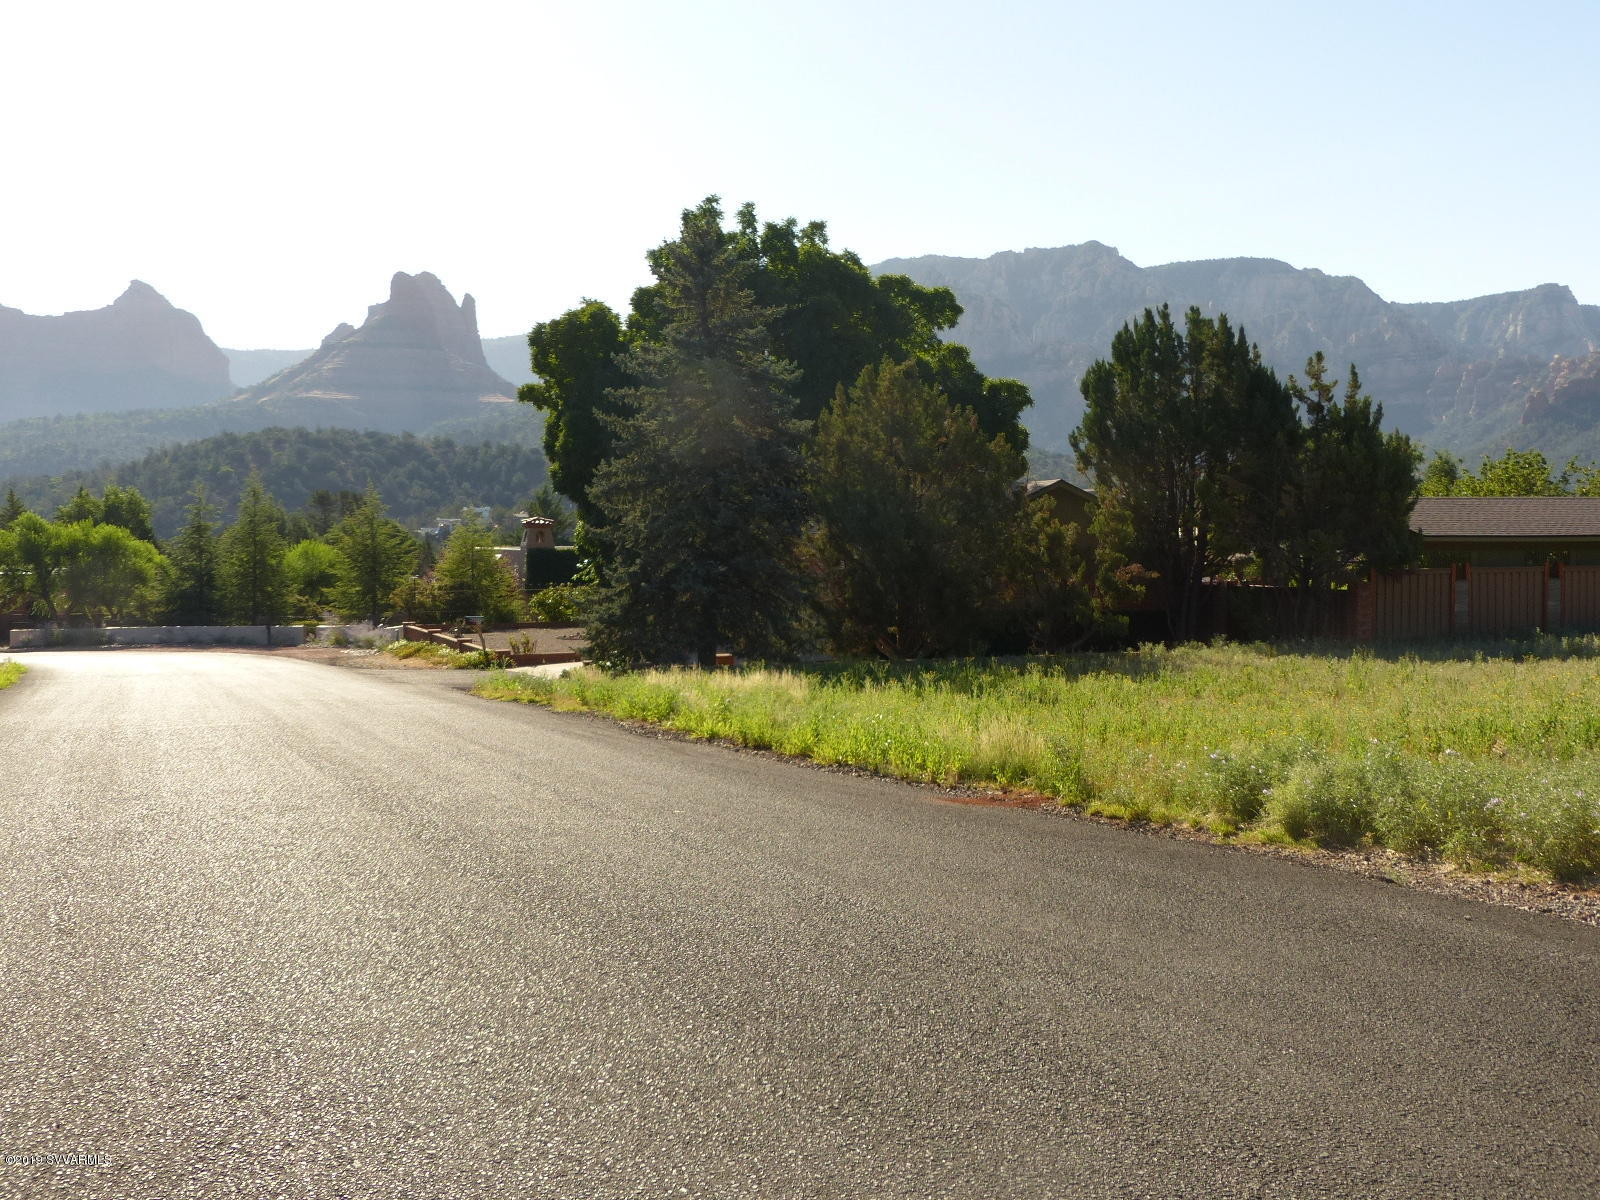 25 Mohave Sedona, AZ 86336